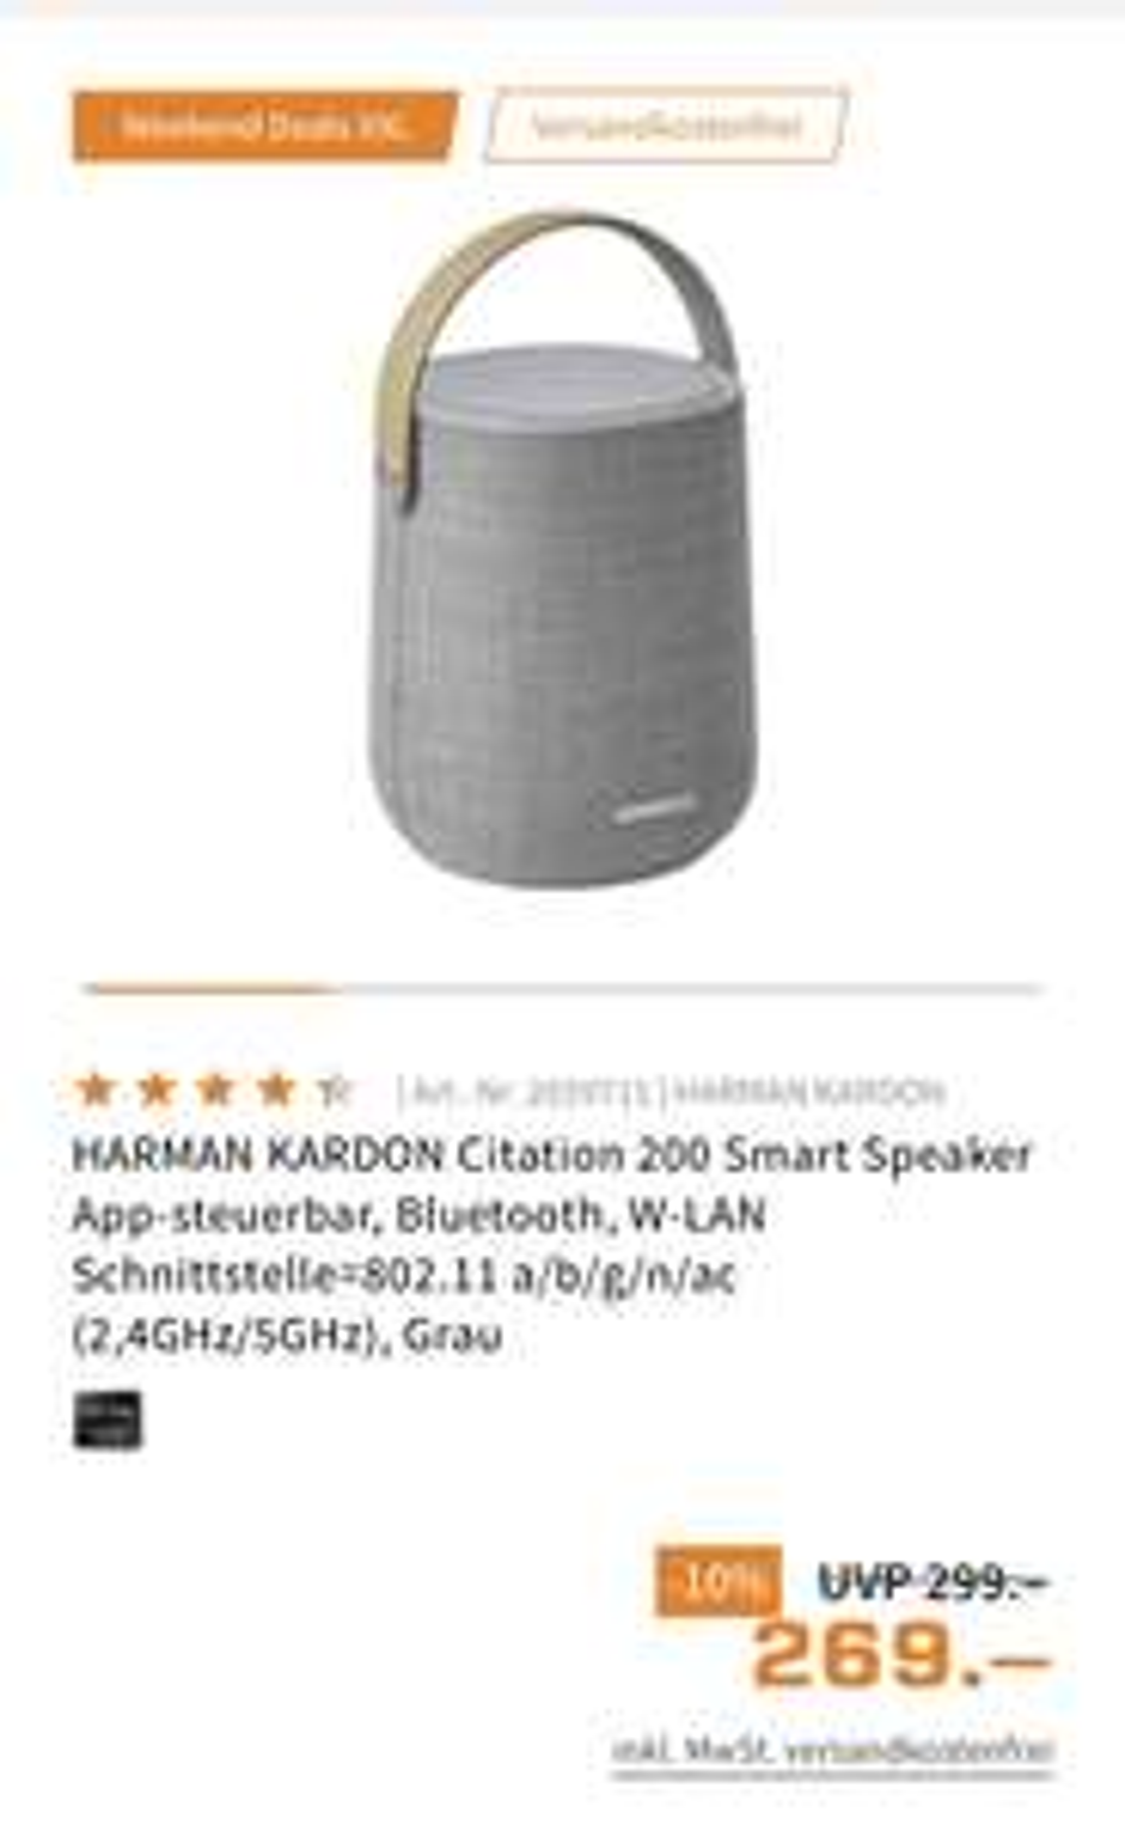 HARMAN KARDON Citation 200 Smart Speaker + 10 fach Payback Punkte